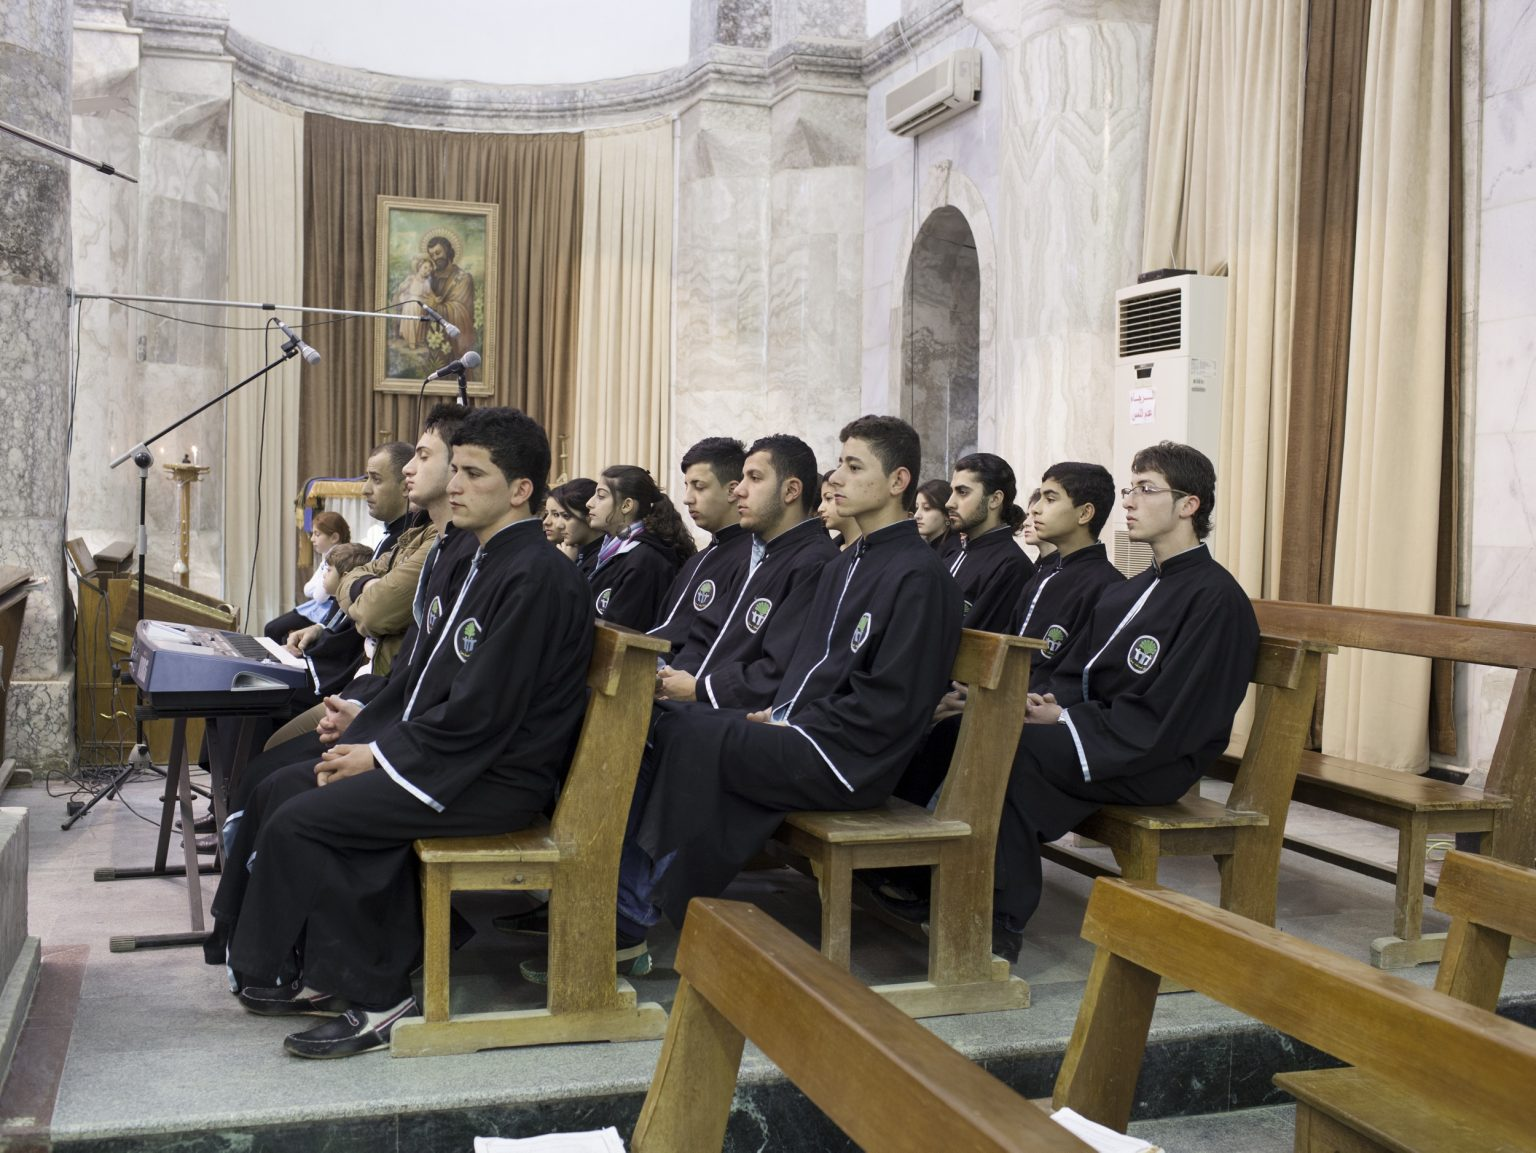 Al-Tahira Church, Syriac Catholic church choir in Qaraqosh, a Christian town on the border between Iraq and Kurdistan.